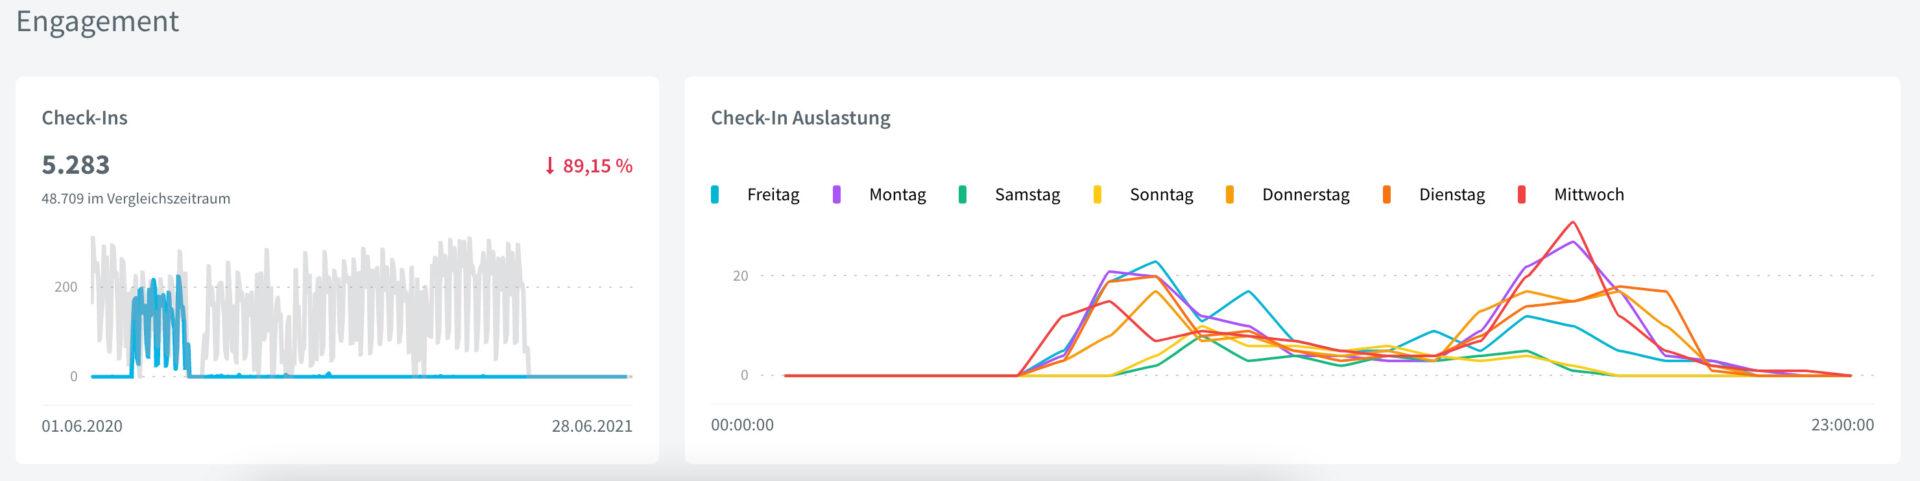 Bild: Analytics Check-ins